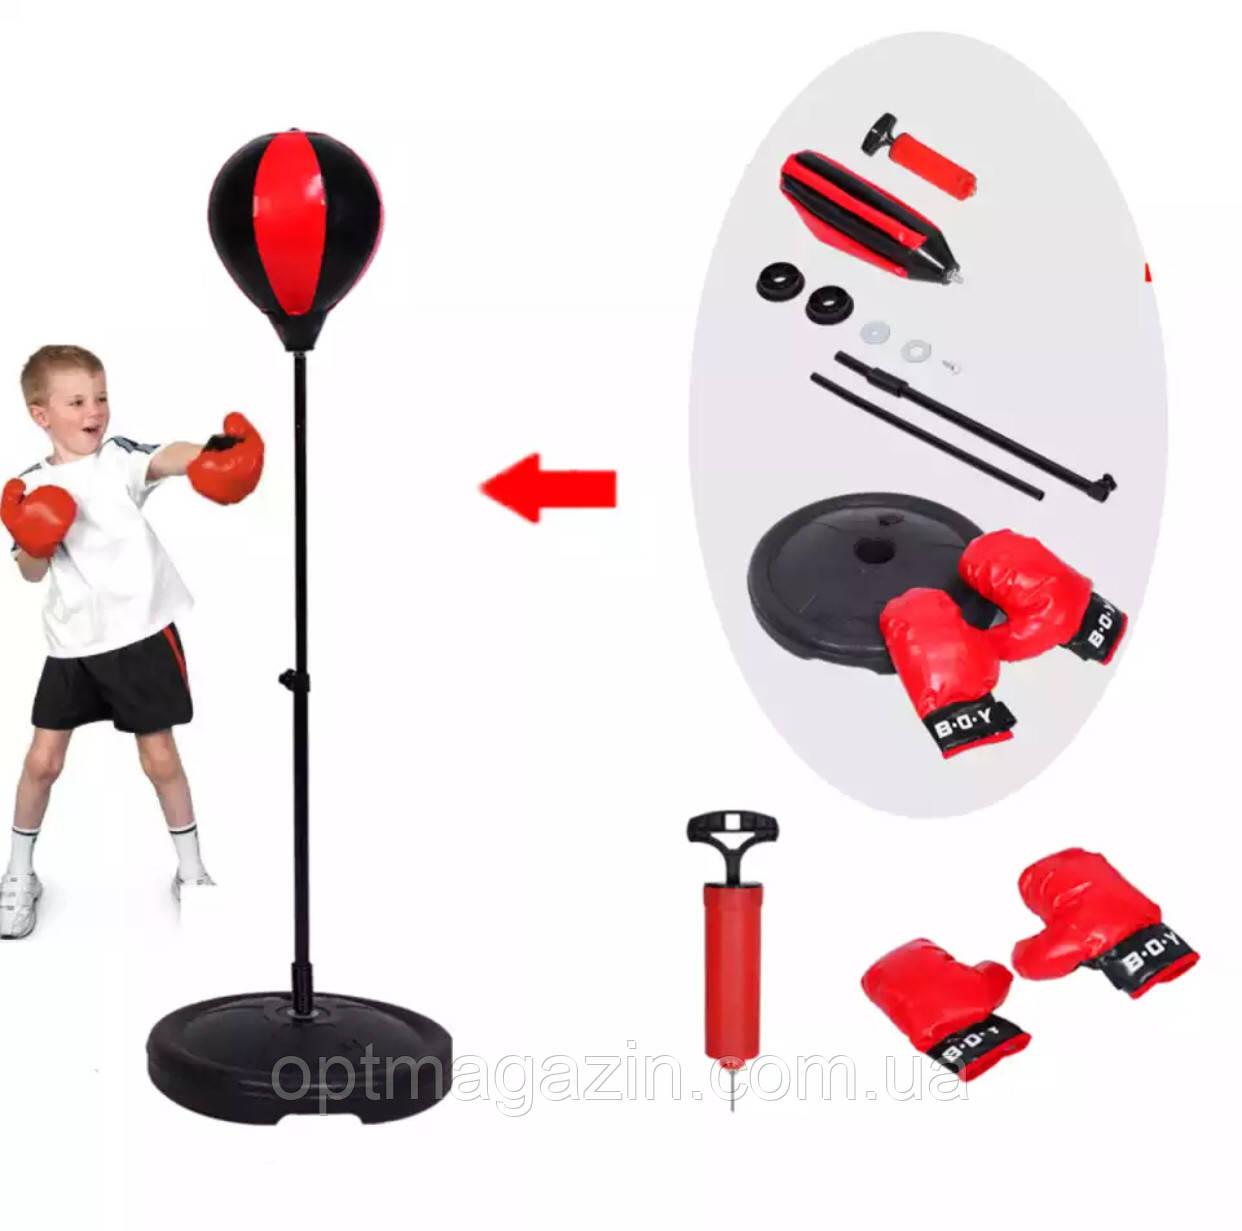 Боксерська груша рукавички - тренажер для боксу Sport Toys Punching Ball дитячий